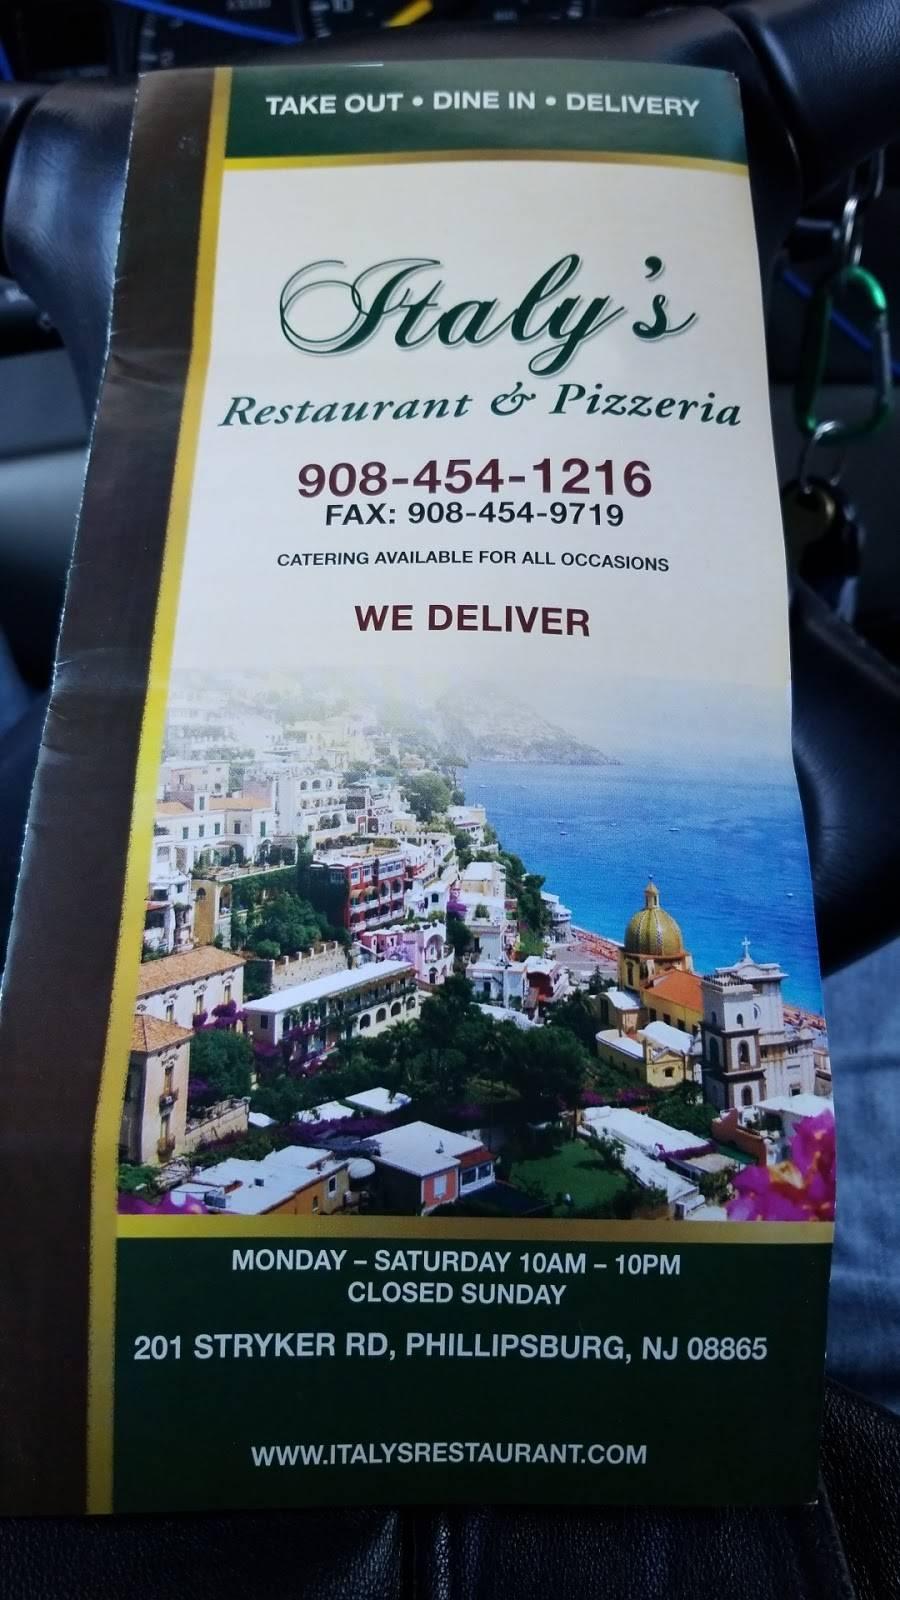 Italys Restaurant & Pizzeria | restaurant | 201 Strykers Rd Ste 18, Phillipsburg, NJ 08865, USA | 9084541216 OR +1 908-454-1216